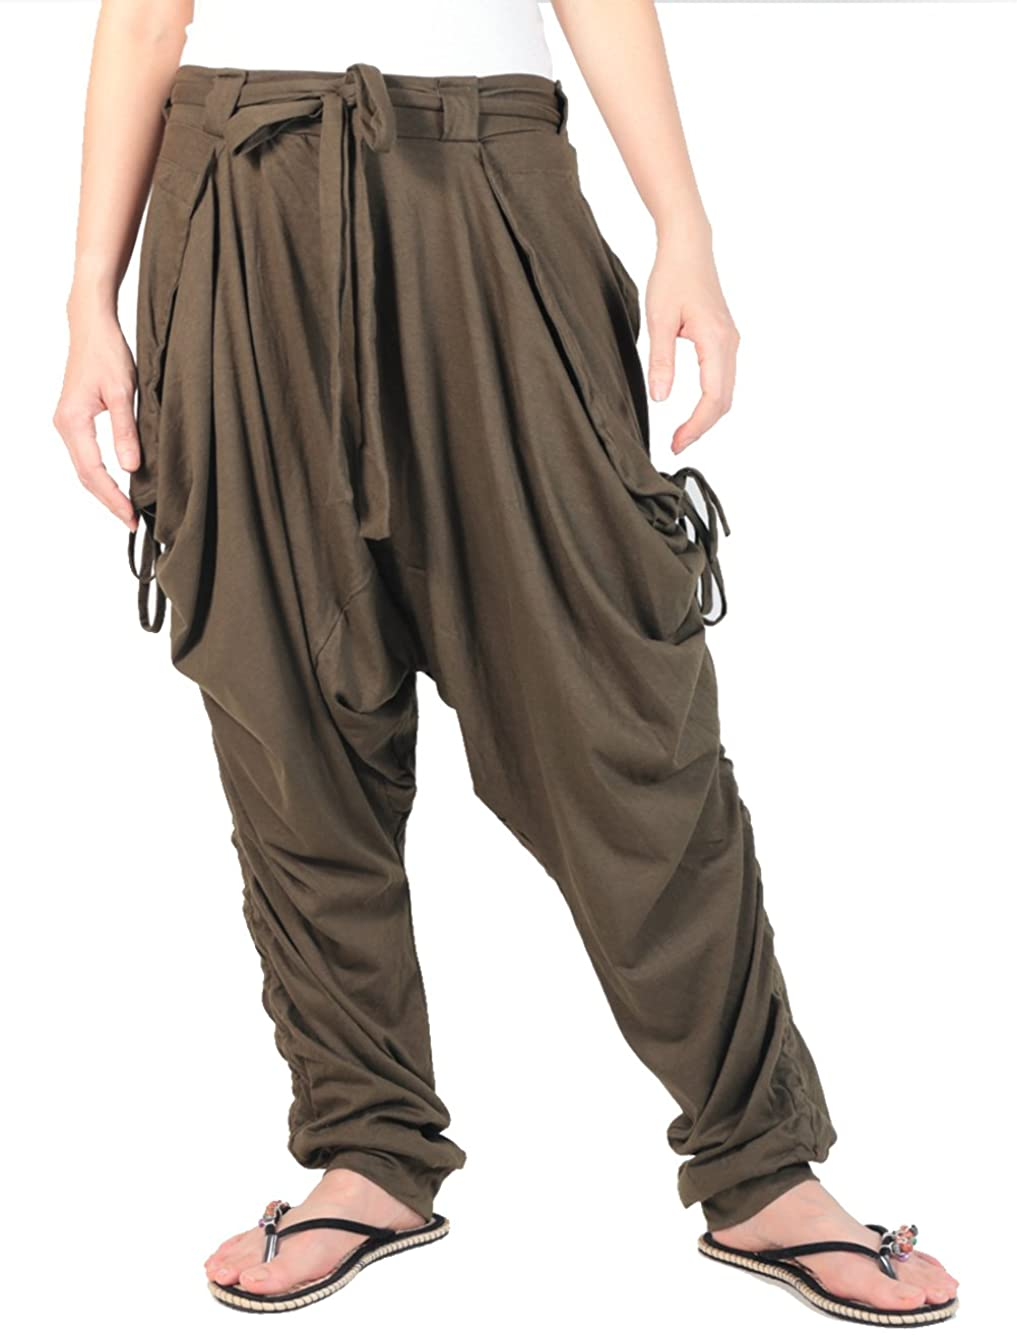 Smileclothing Unisex Jersey Pants, Yoga Pants, Harem Pants, Casual Pants Dark Green, Large Size (ch18-GR)